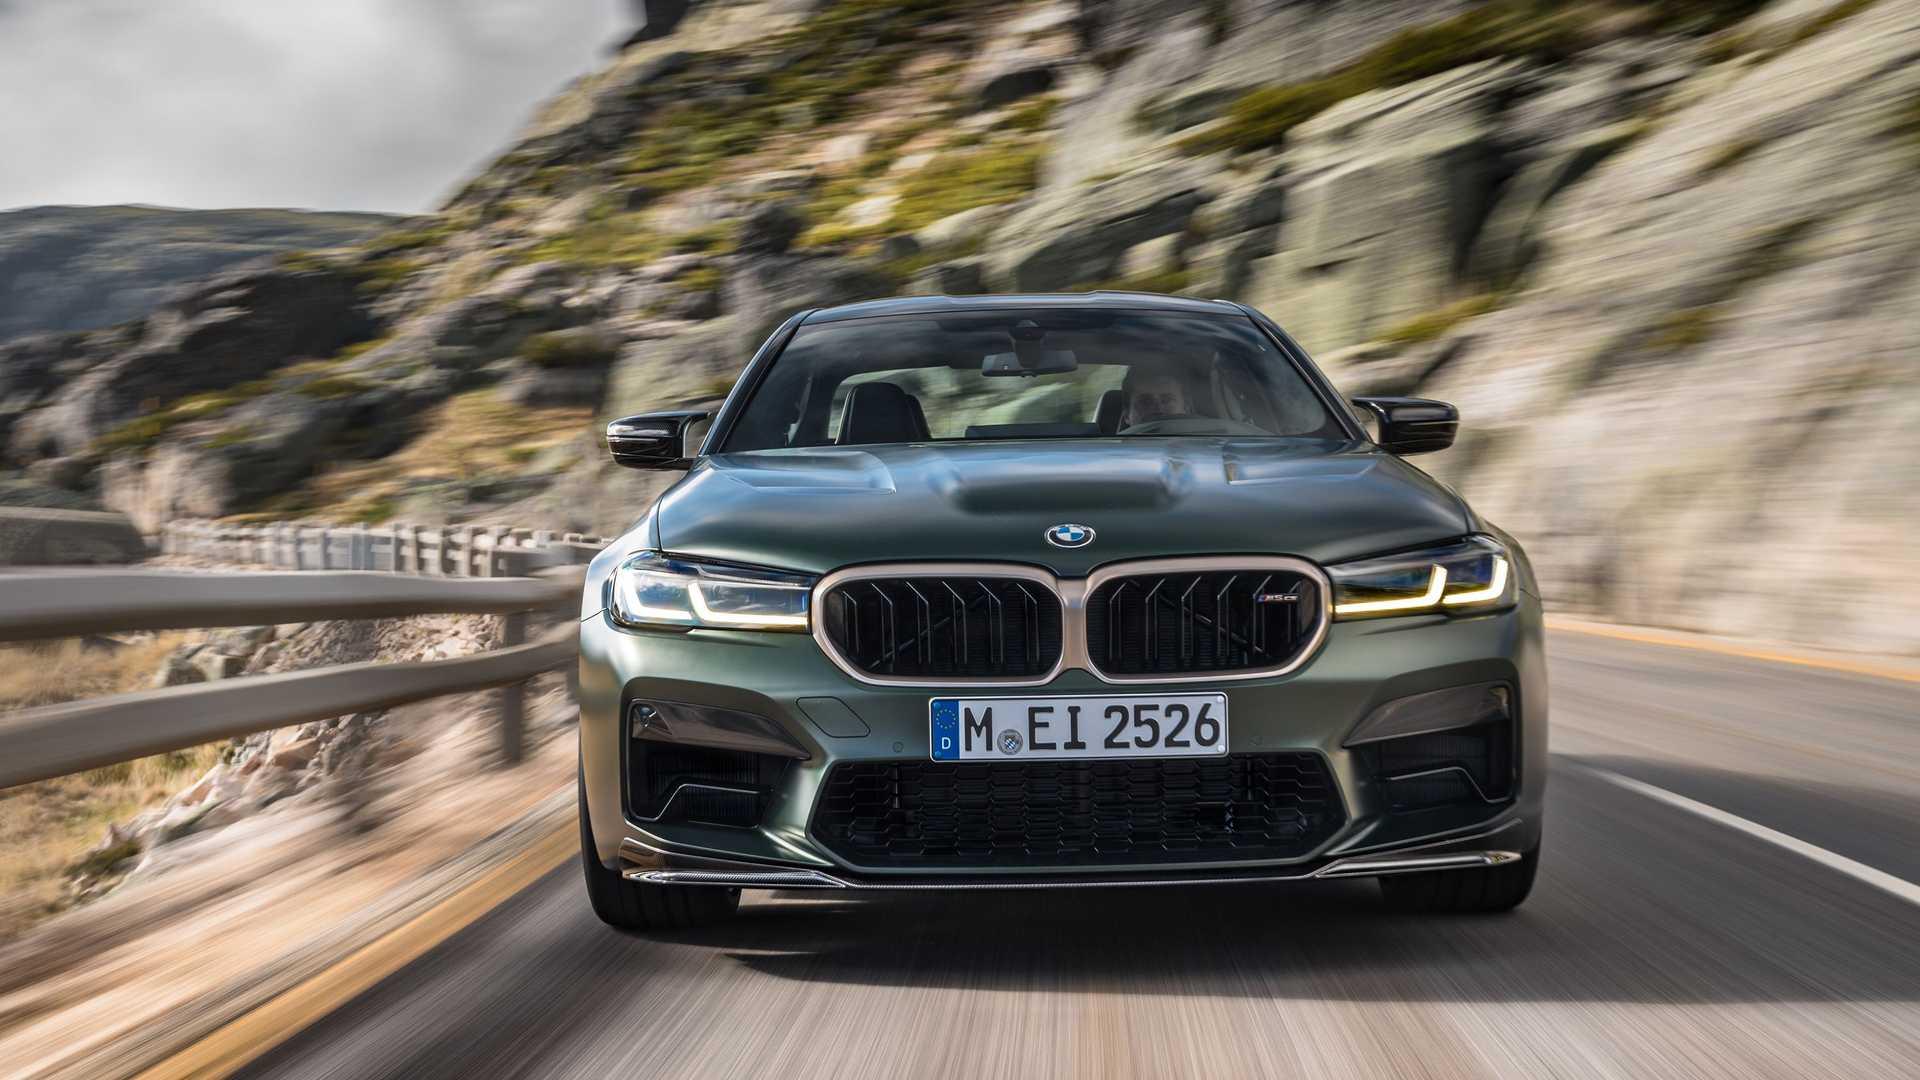 BMW traz ao Brasil o super esportivo M5 e Haus Fortaleza aceita encomenda